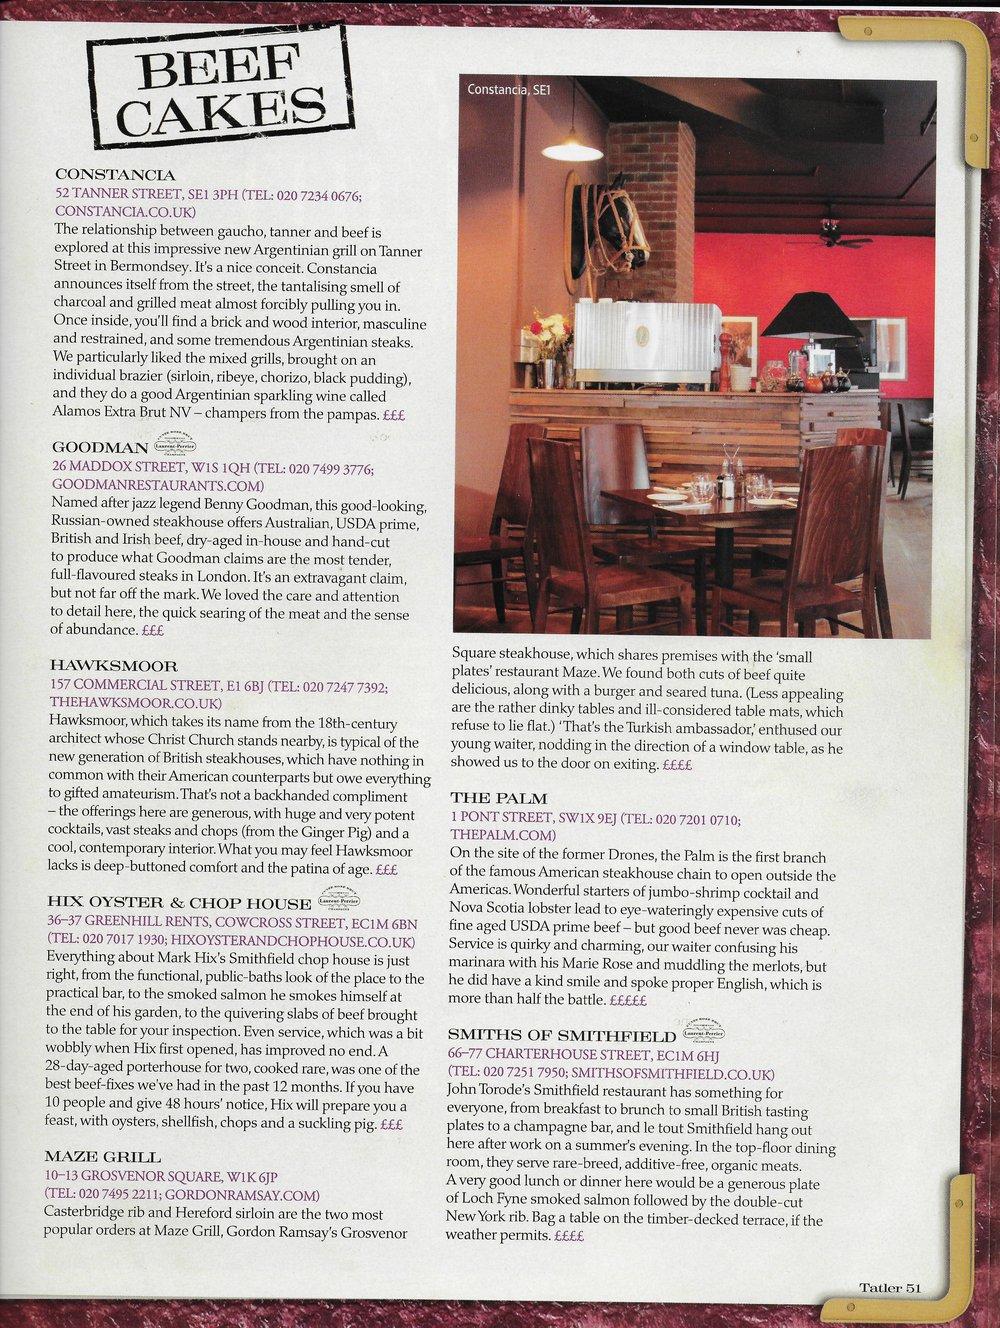 Tatler Restaurant Guide 2010 - Constancia - Beef Cakes.jpeg